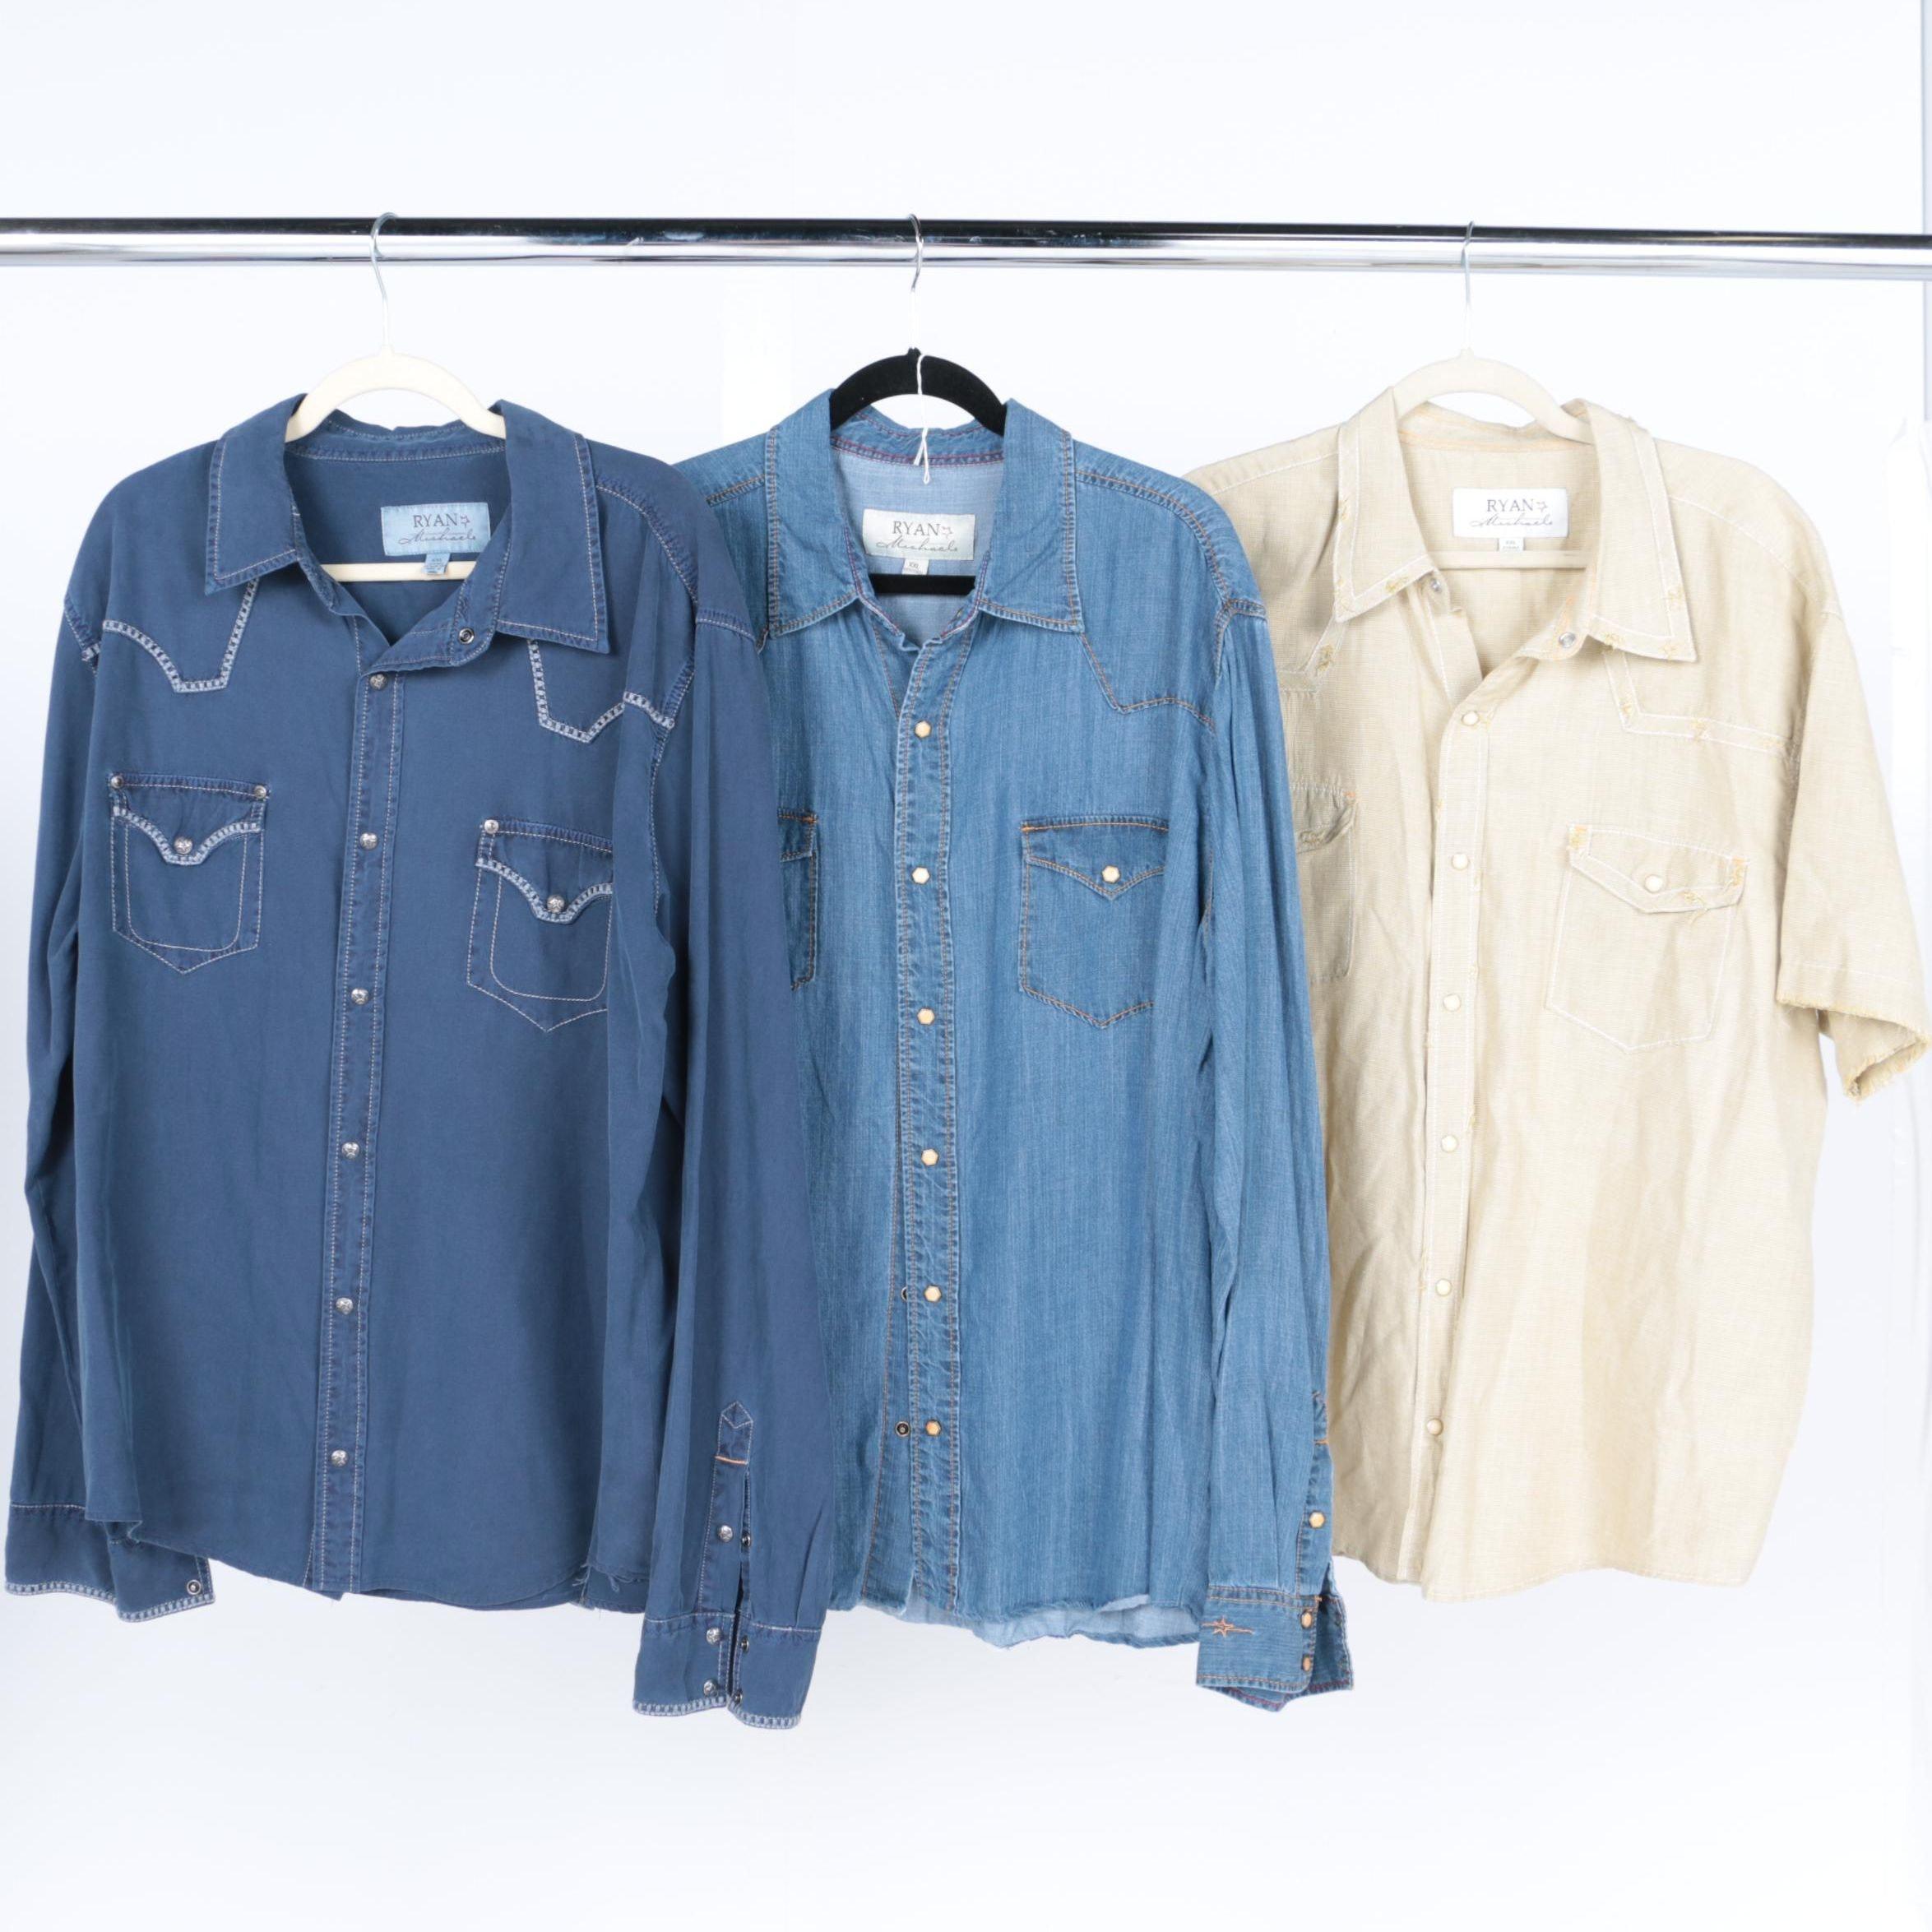 Ryan Michael Button Up Shirts